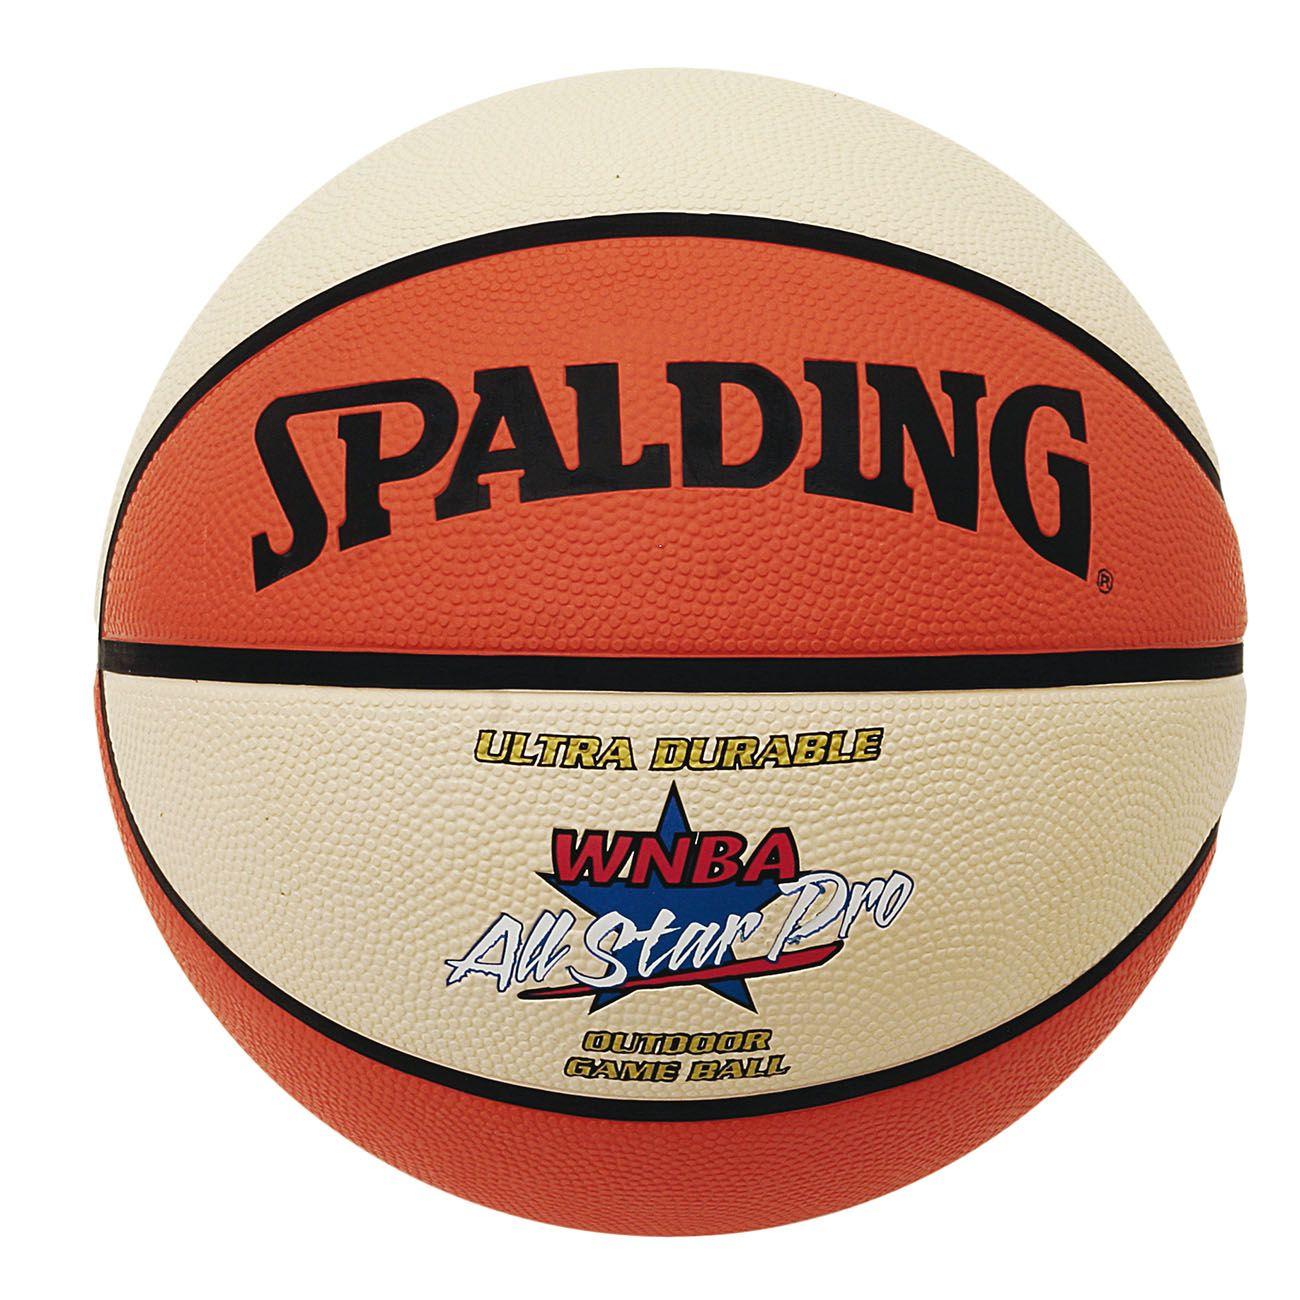 spalding wnba all star pro outdoor basketball. Black Bedroom Furniture Sets. Home Design Ideas